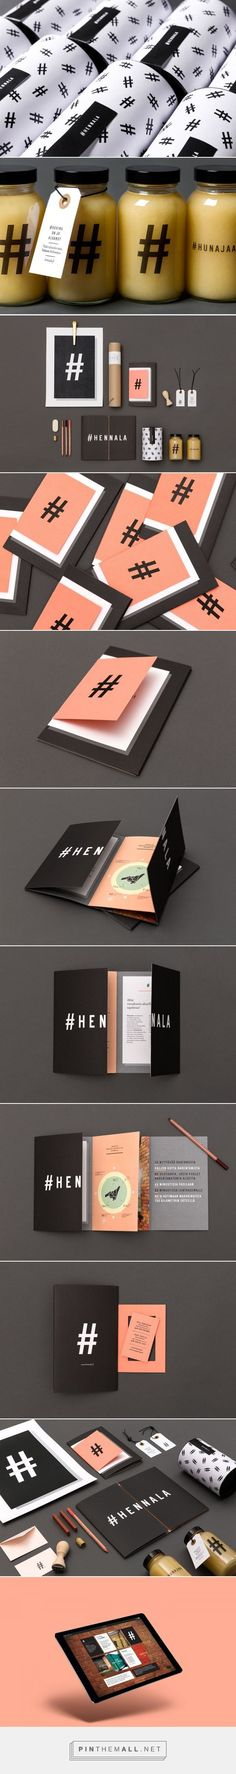 Branding | Graphic Design |  Hennala Visual Identity on Behance